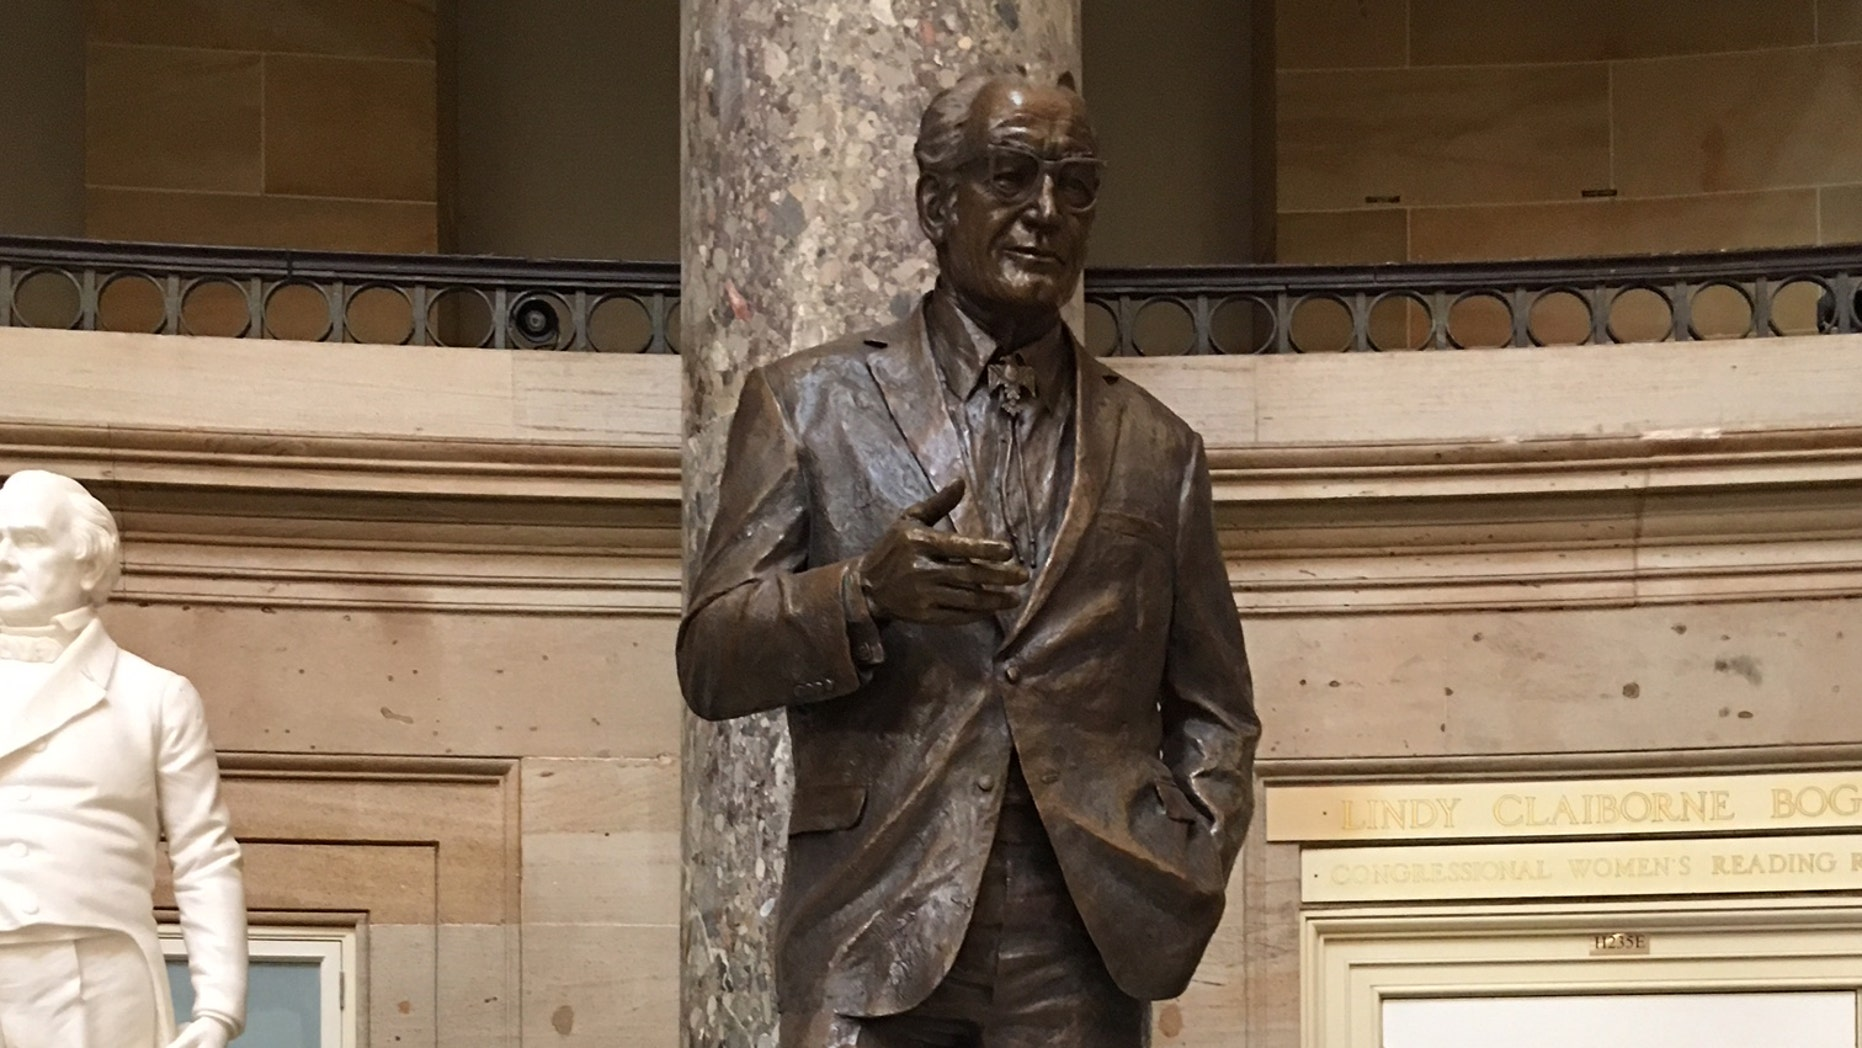 The statue of Sen. Barry Goldwater, R-Ariz., in the Capitol's Statuary Hall. Goldwater was Sen. JOhn McCain's Senate predecessor.